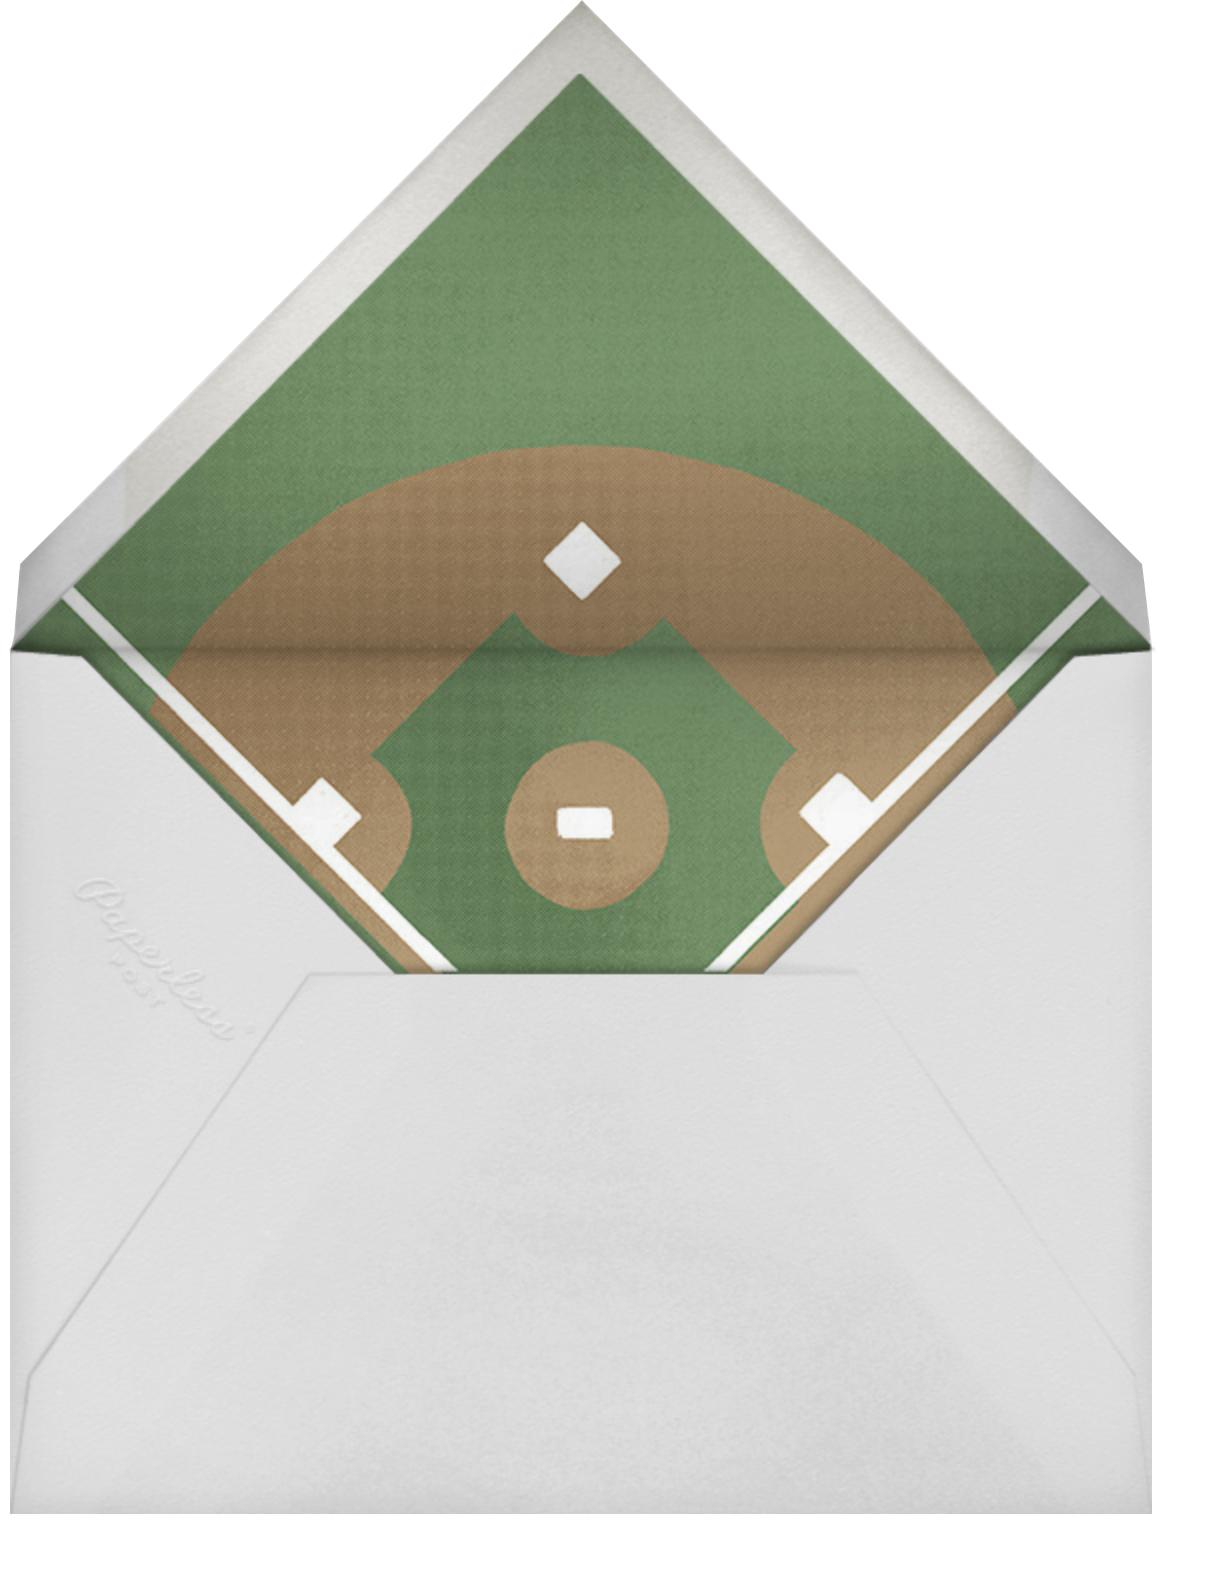 Courtside Seats - Baseball - Paperless Post - Sports - envelope back